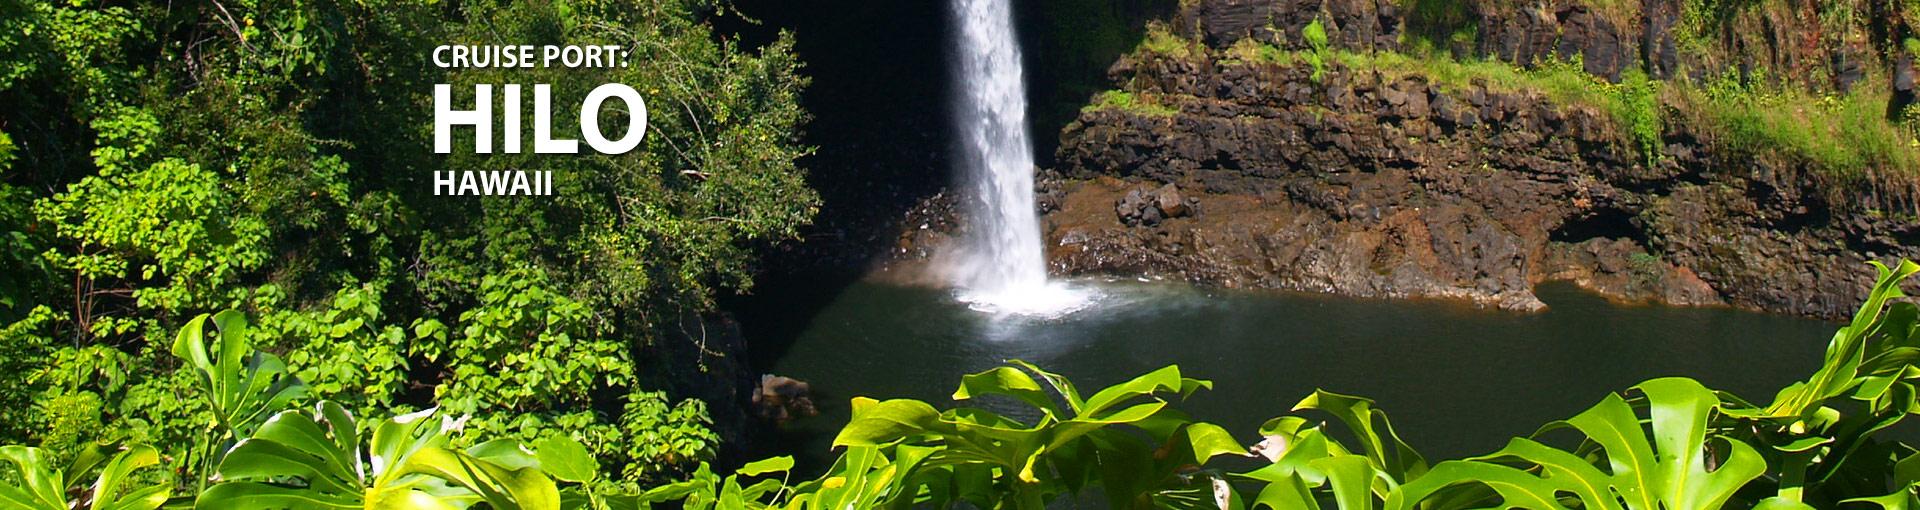 Cruise Port: Hilo, Hawaii